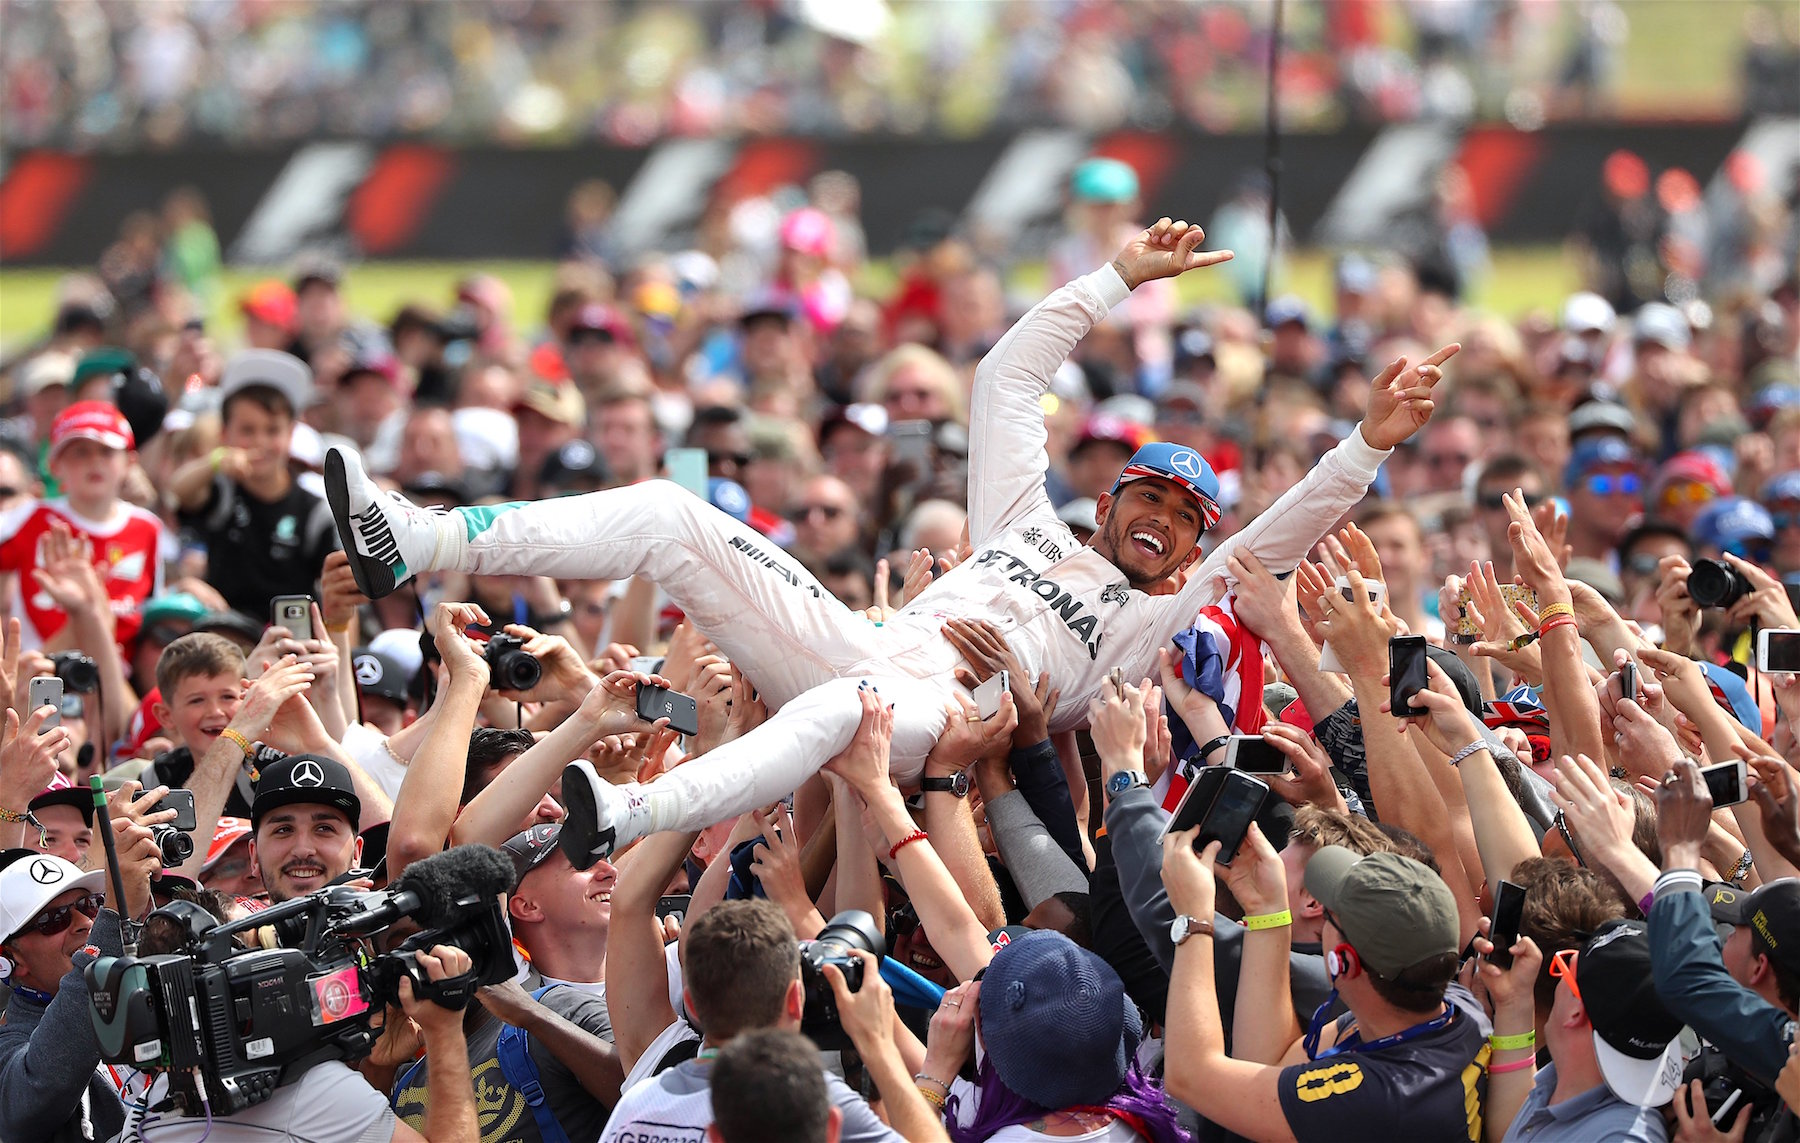 Salracing | Lewis Hamilton crowd surfing